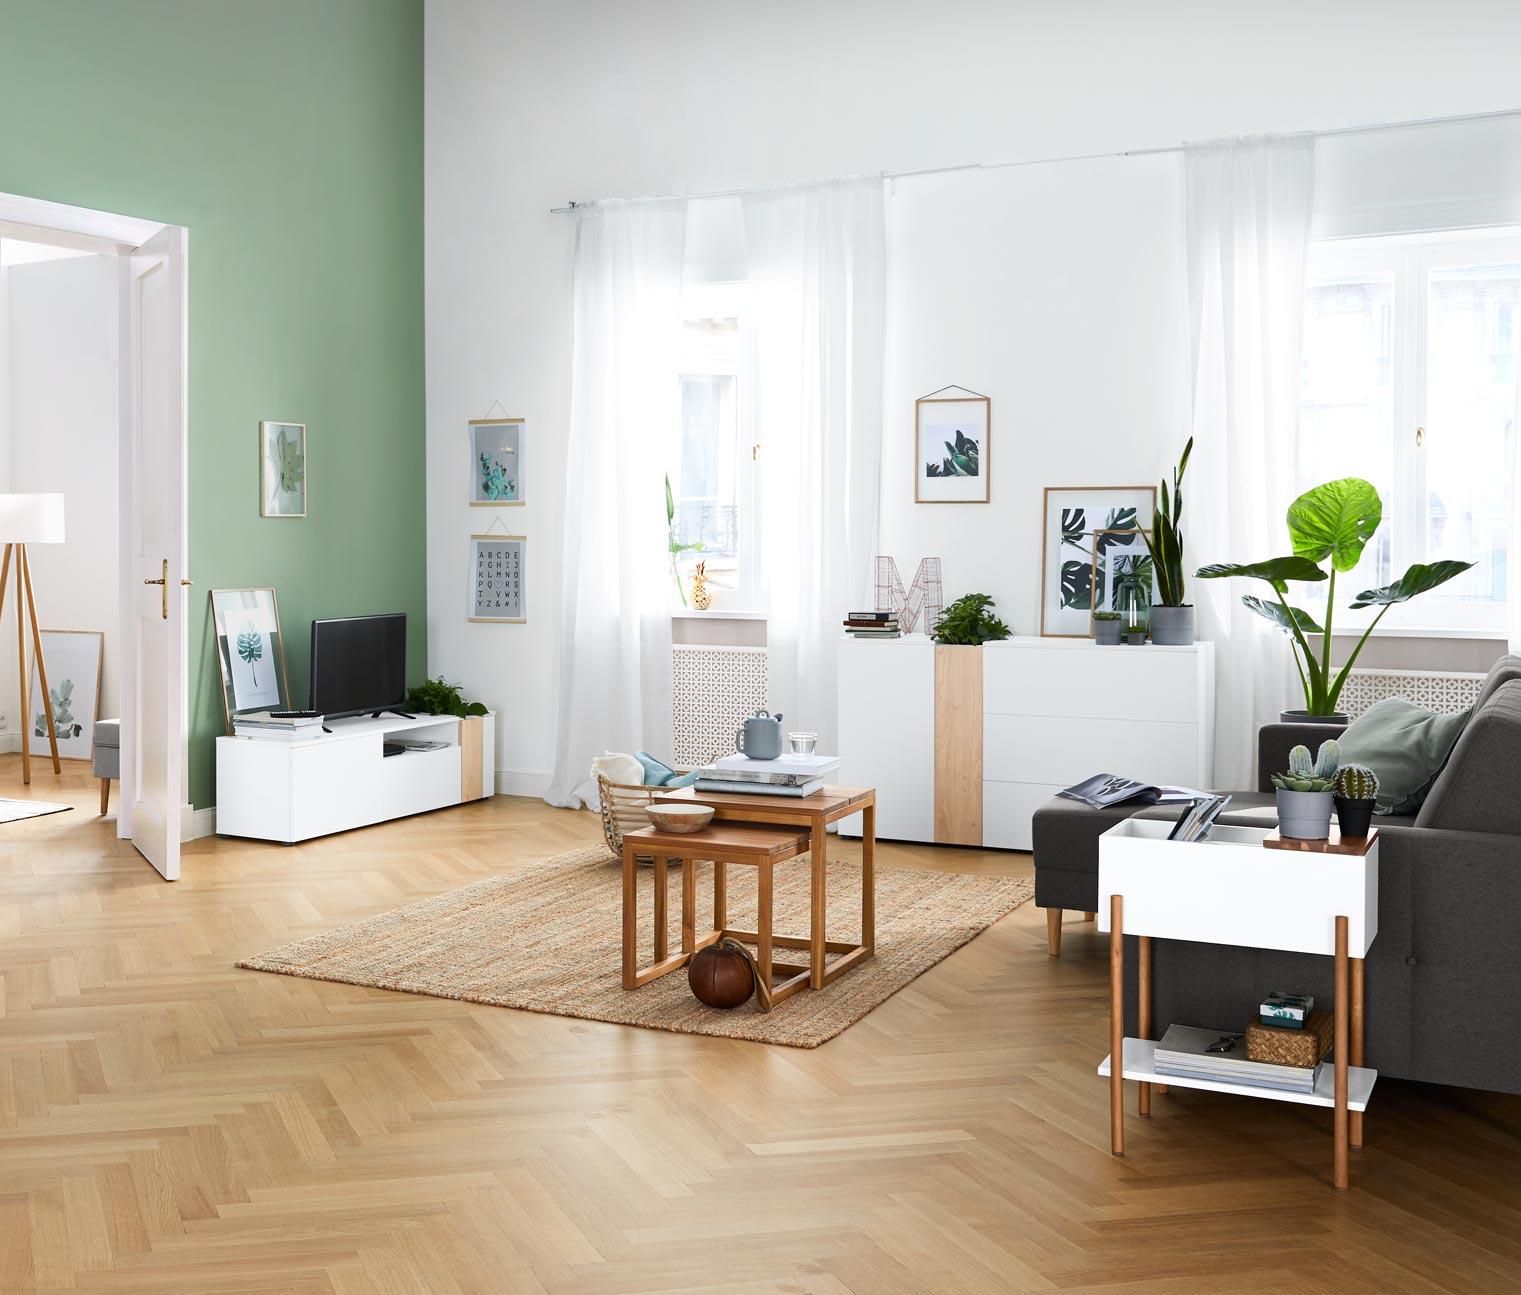 Image of Bepflanzbares TV-Lowboard